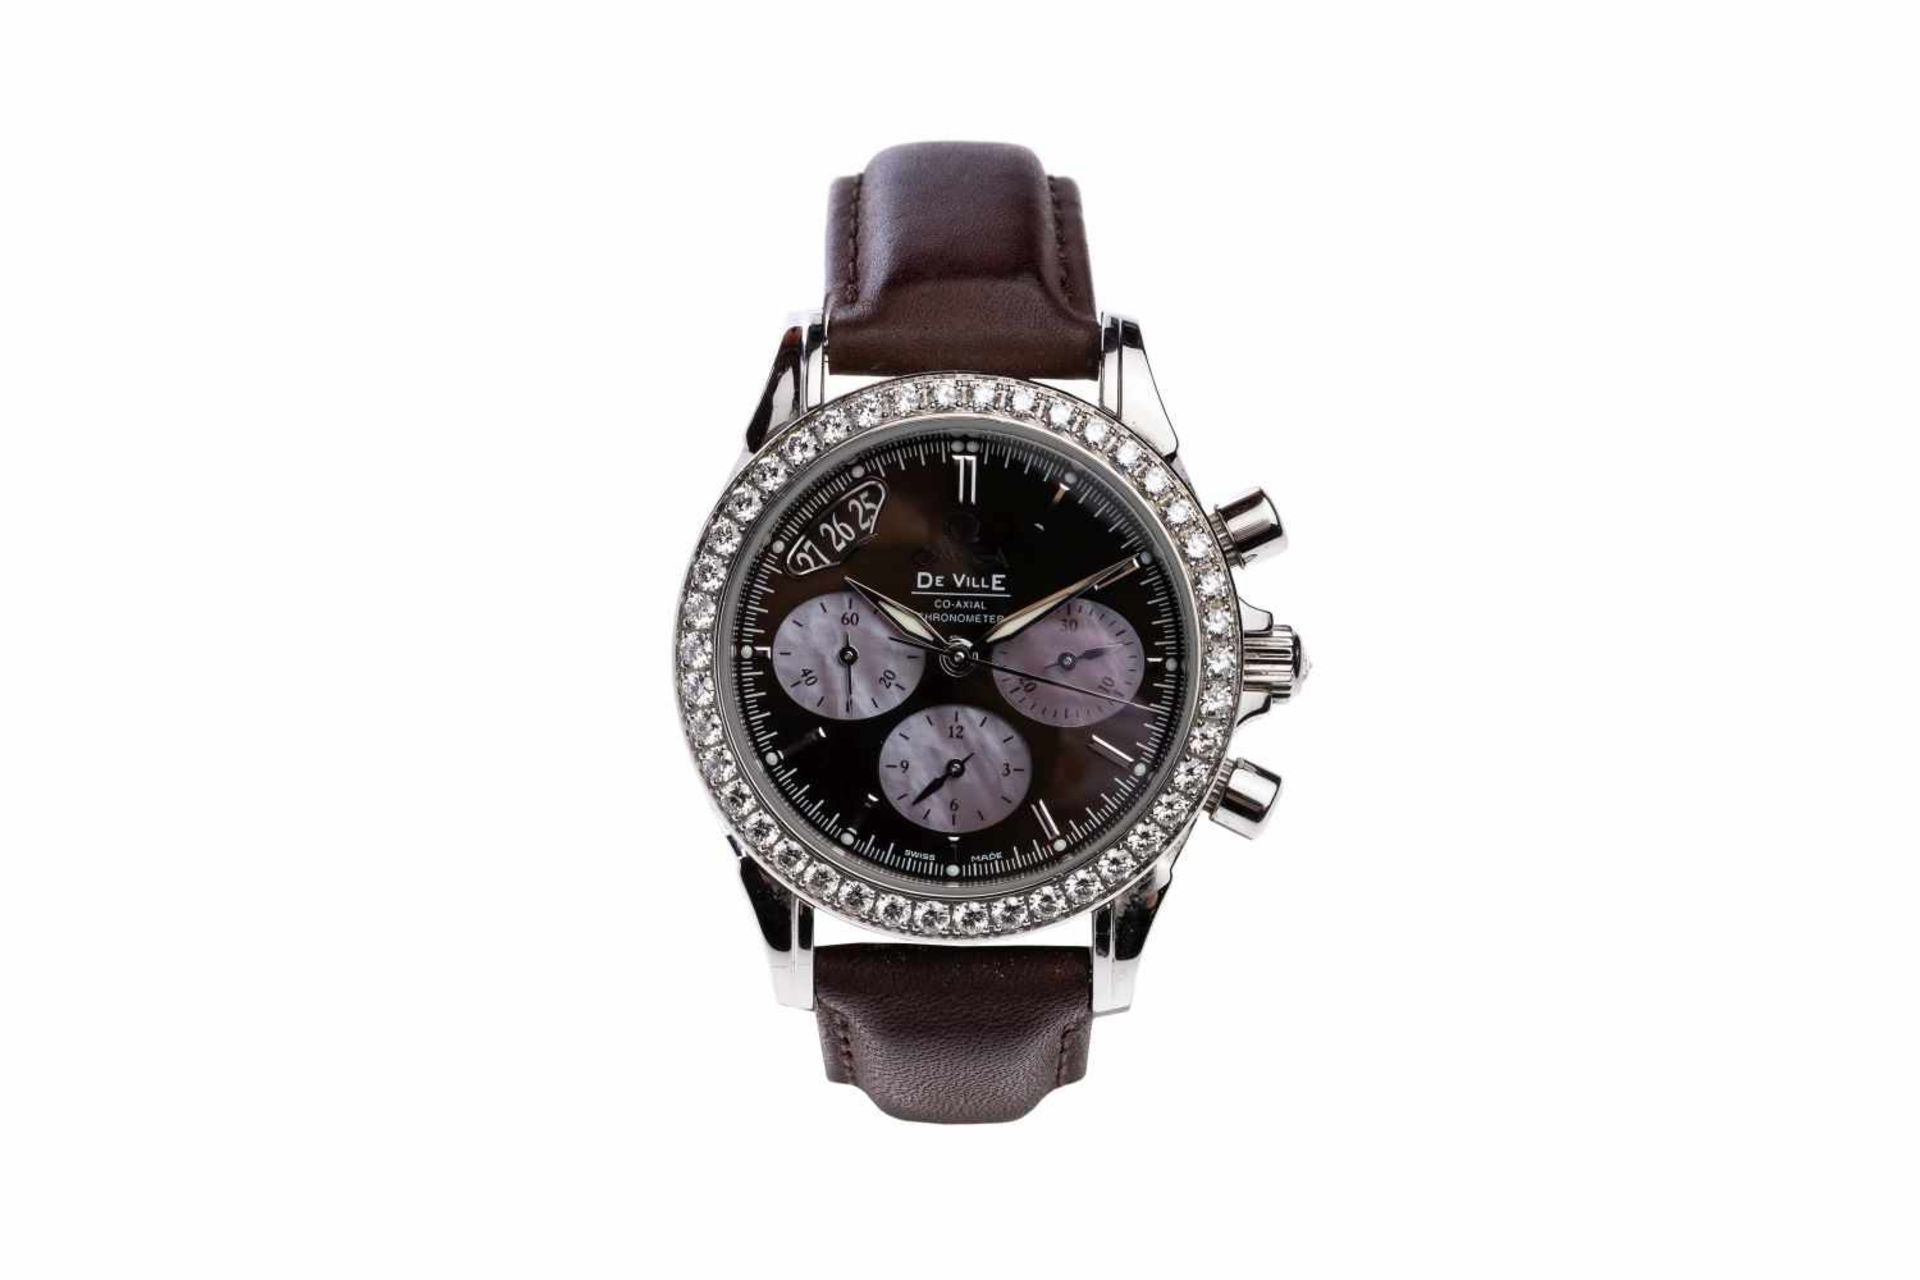 Los 27 - Omega De VillePre owned ladies watch with Diamond Bezel 1.61 carat, automatic movement case 35mm,